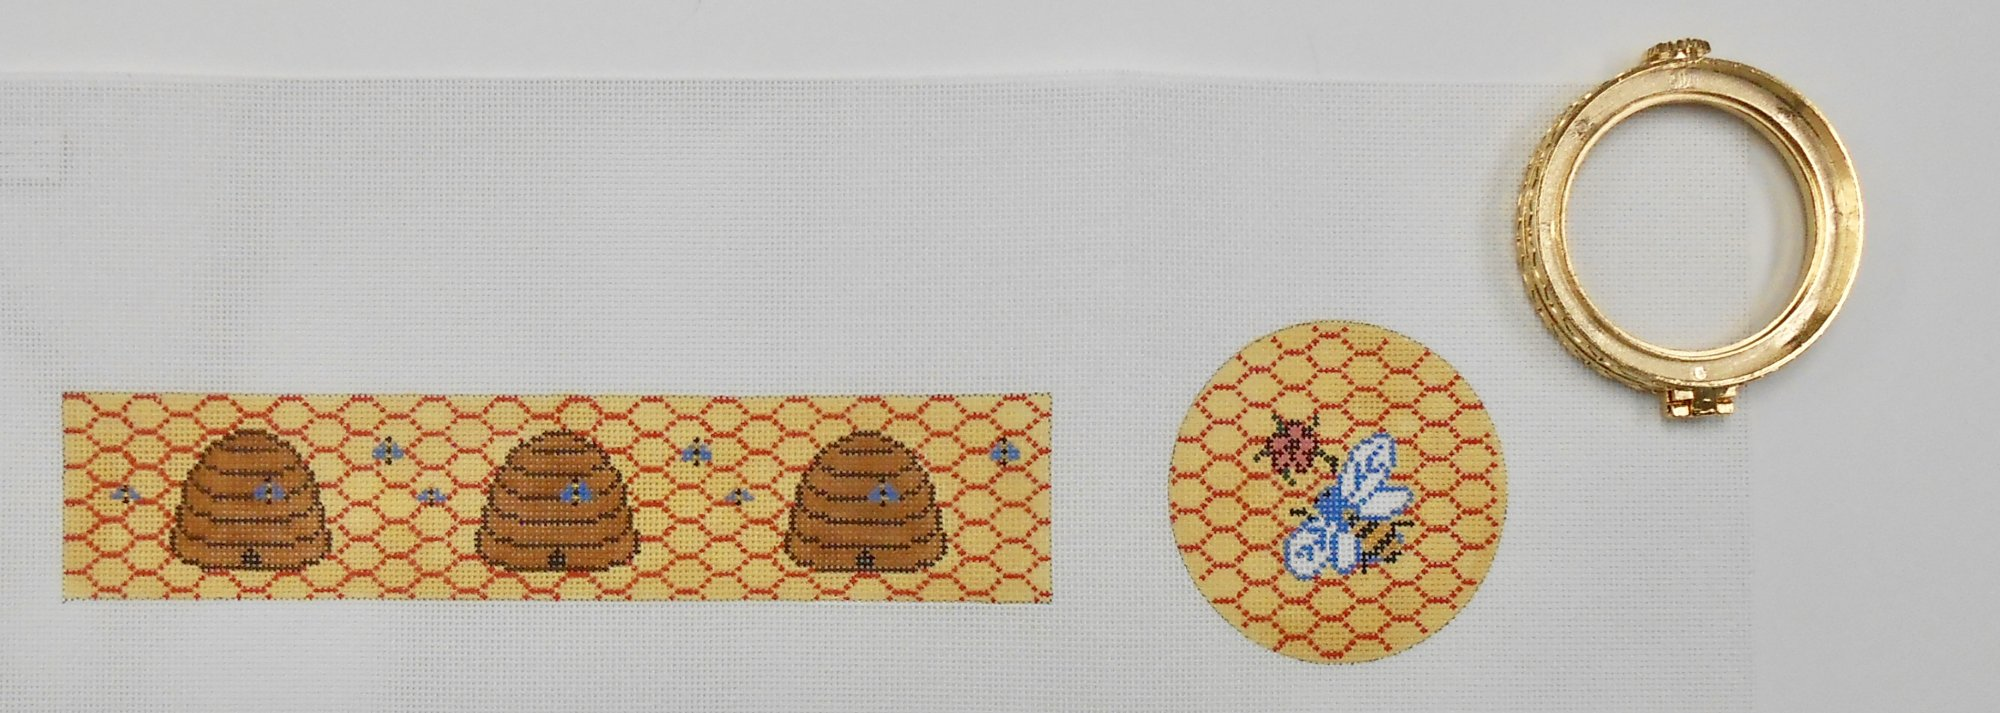 Bumble Bee Hinged Box - Large